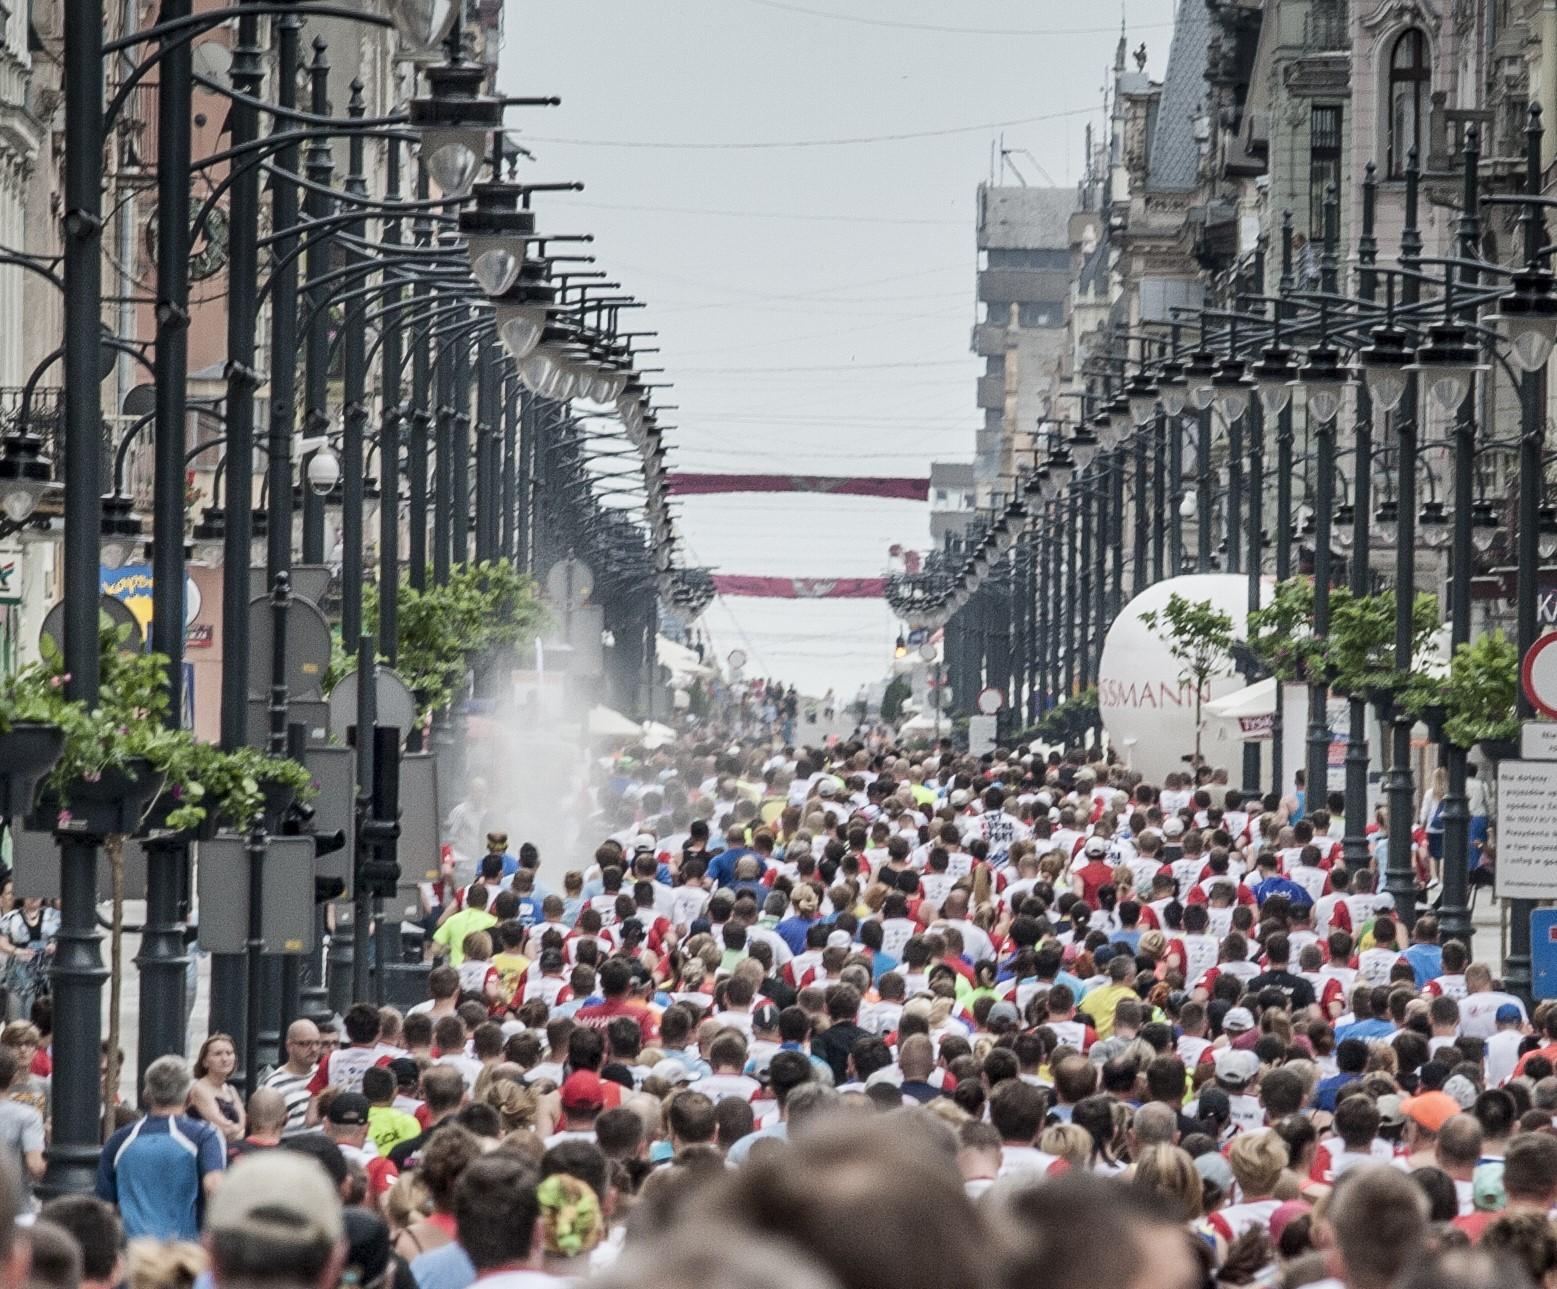 Bieg Ulicą Piotrkowską Rossmann Run 2020 – ruszają zapisy